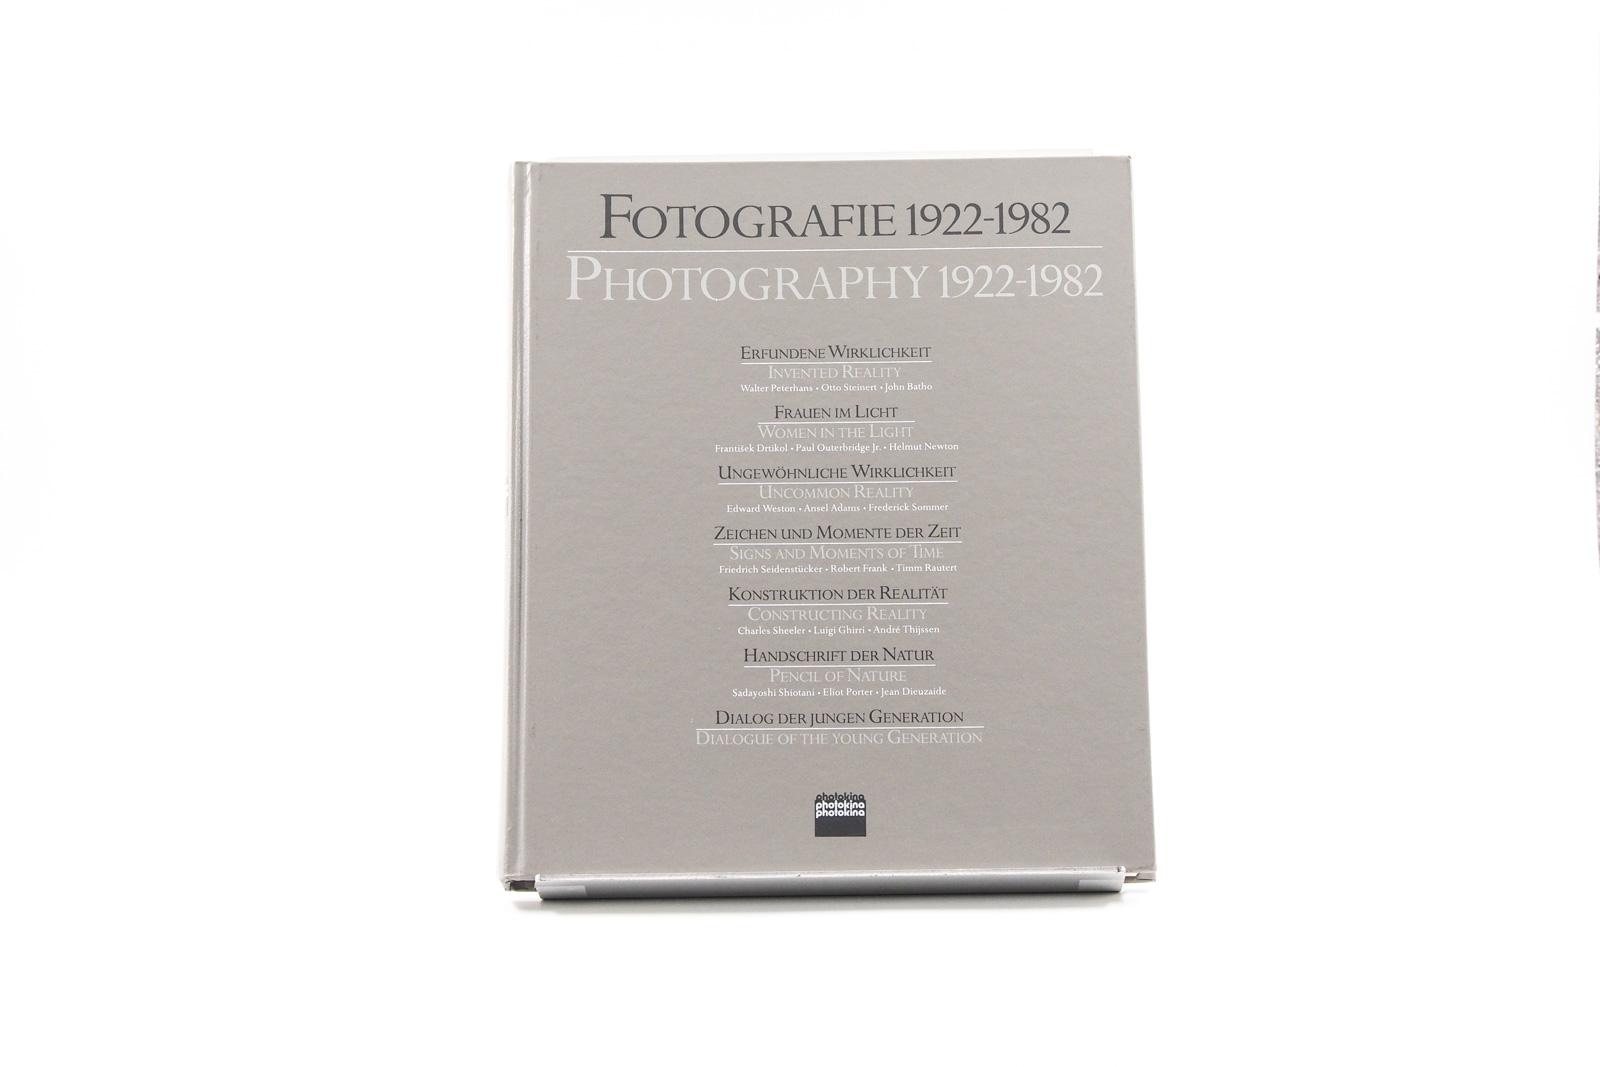 Fotografie 1922 - 1982 (Photokina 1982)